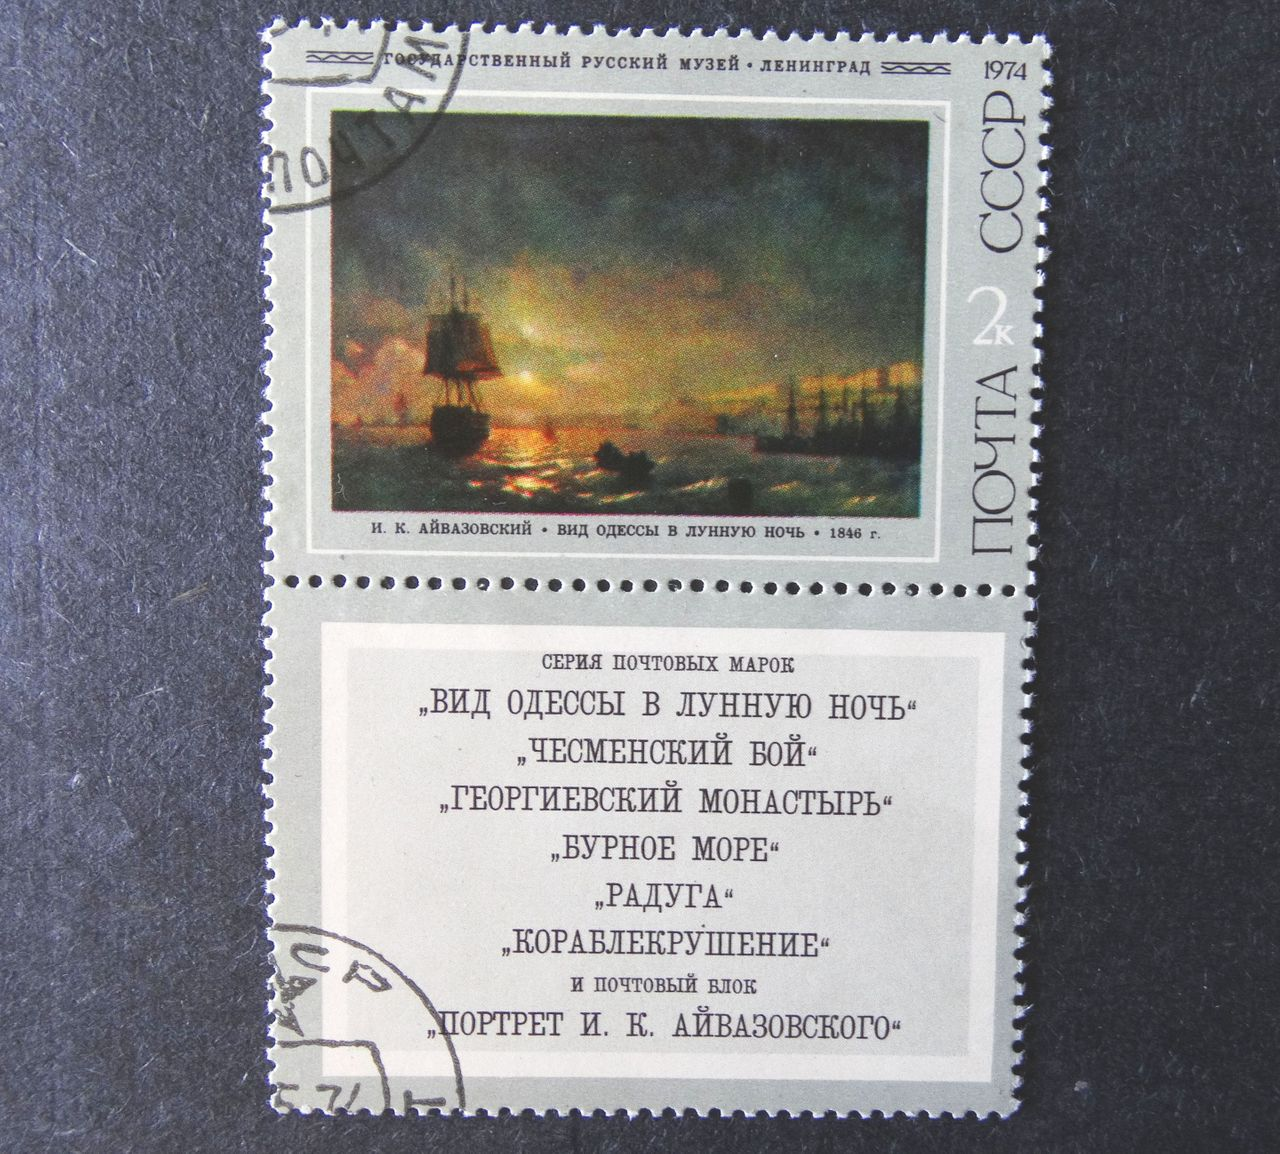 DSC07551.JPG